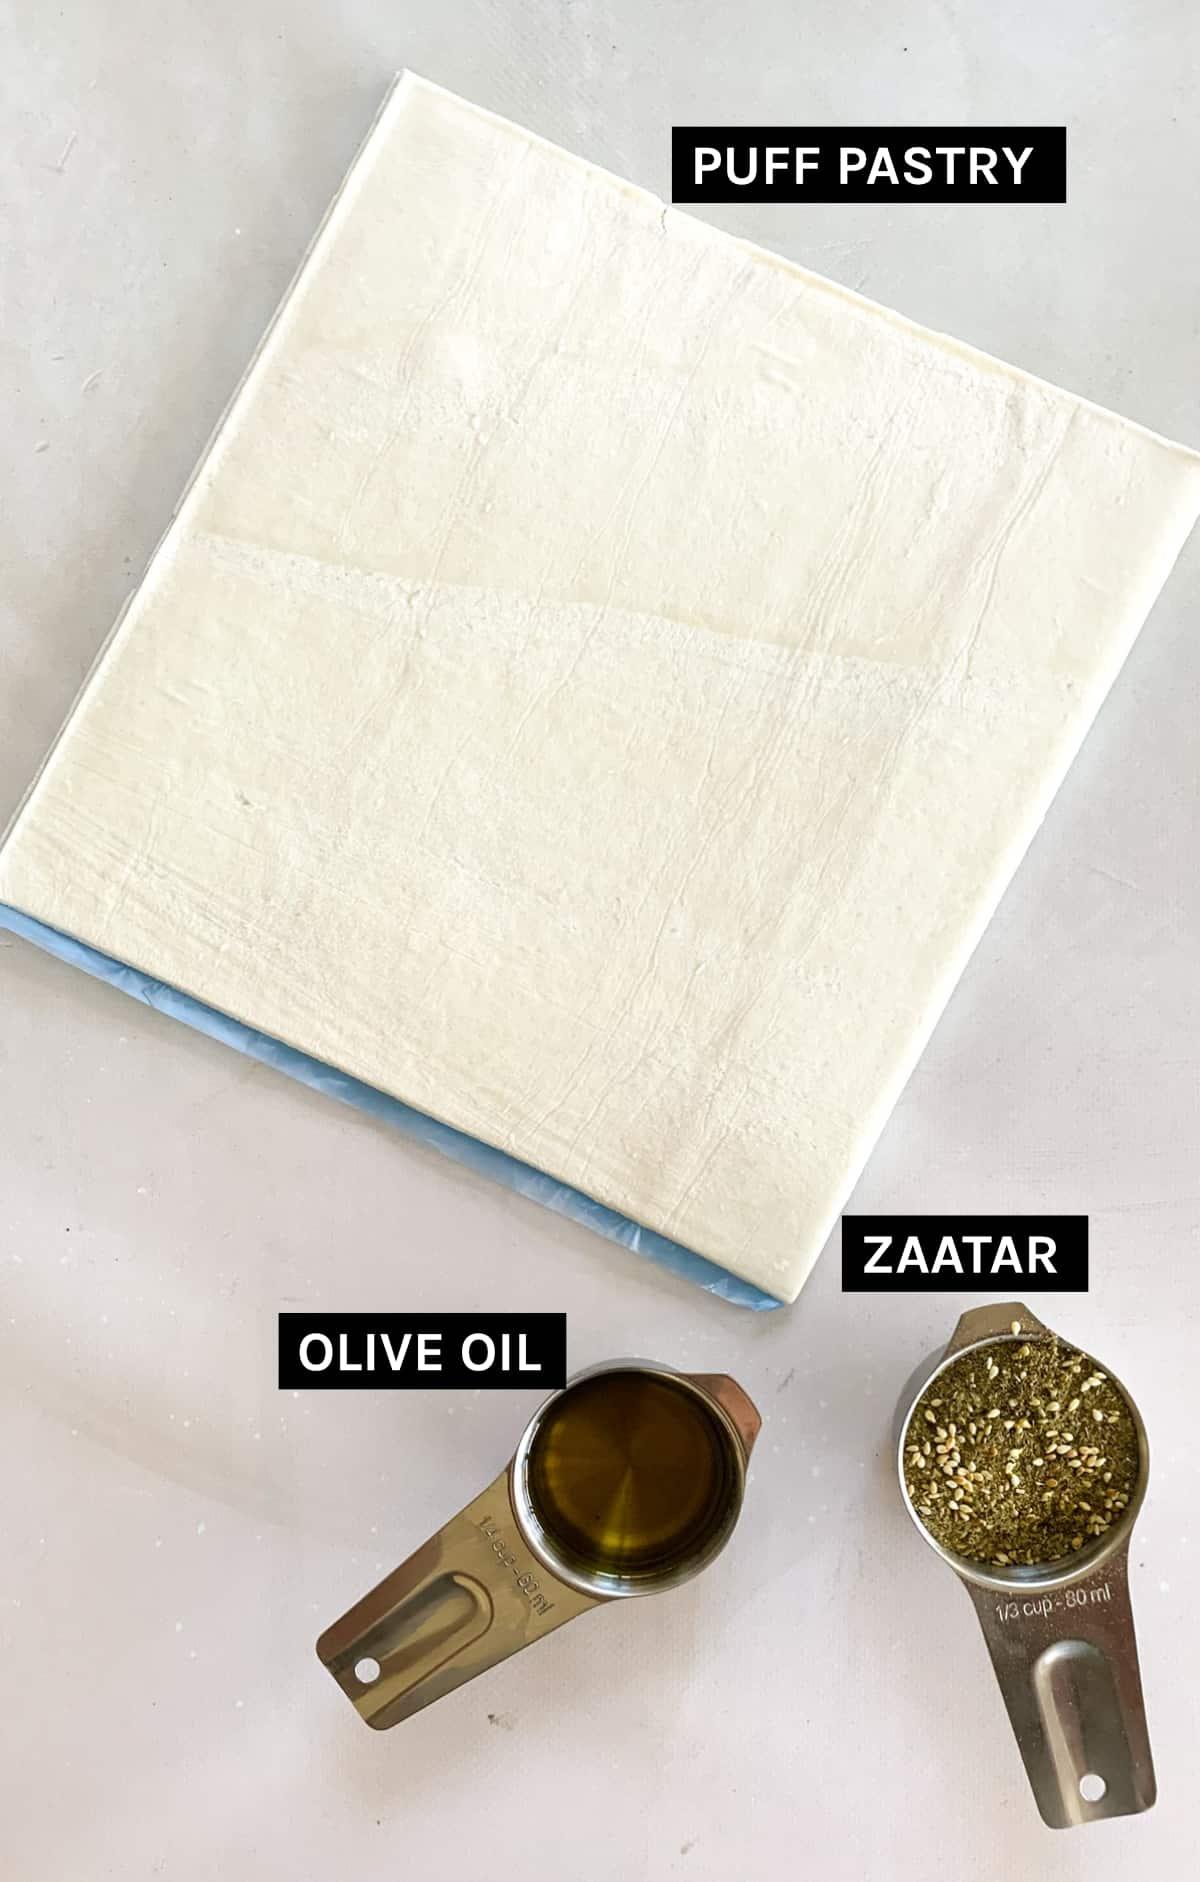 Zaatar pinwheels ingredients